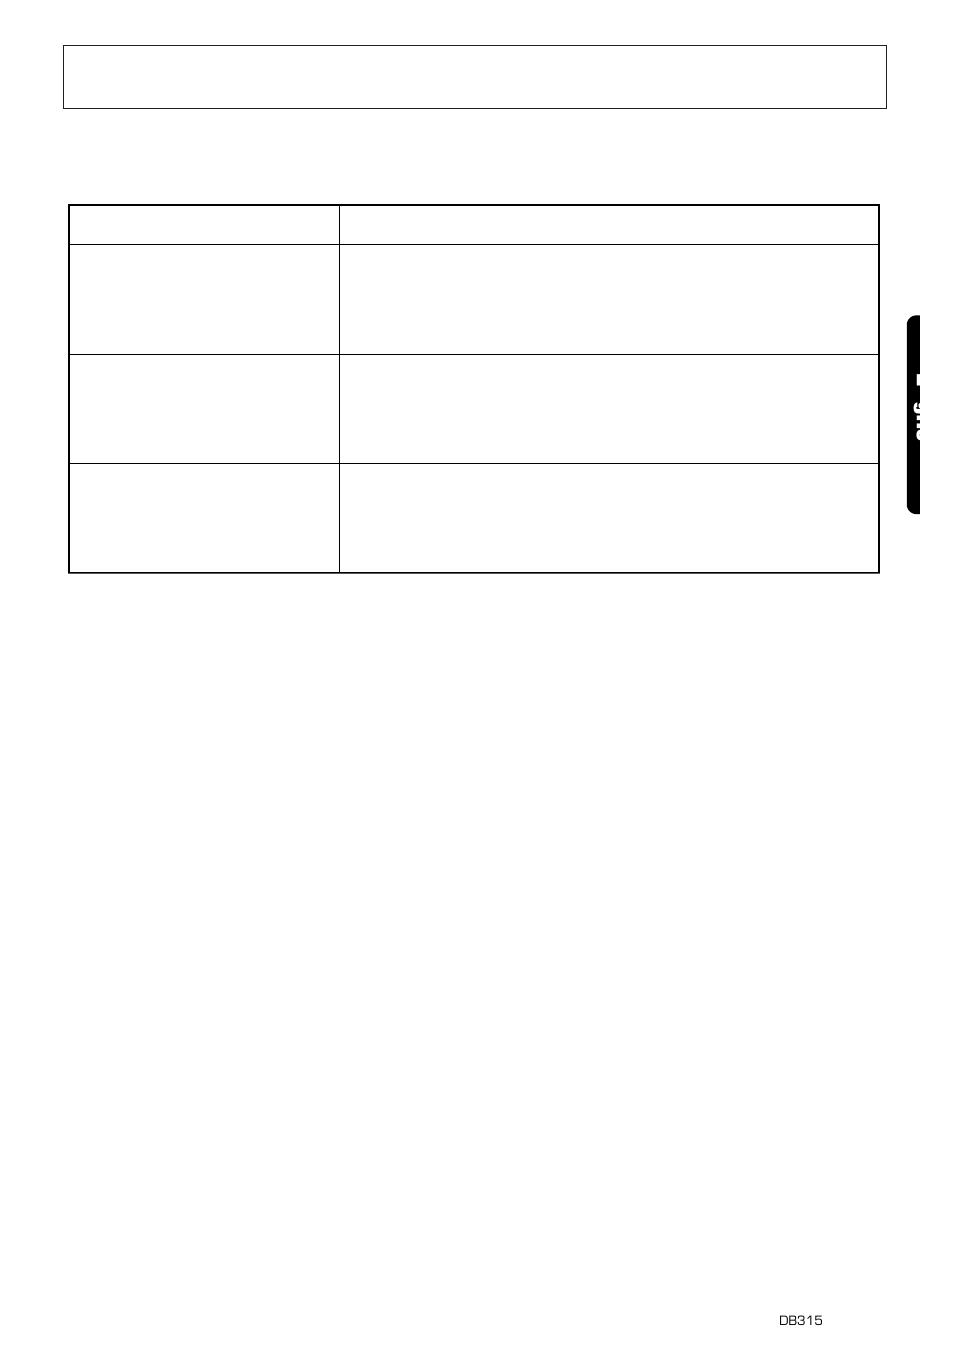 Error displays, Cd er2 cd er3 cd er6, 15 e glis | Clarion DB315 User ...